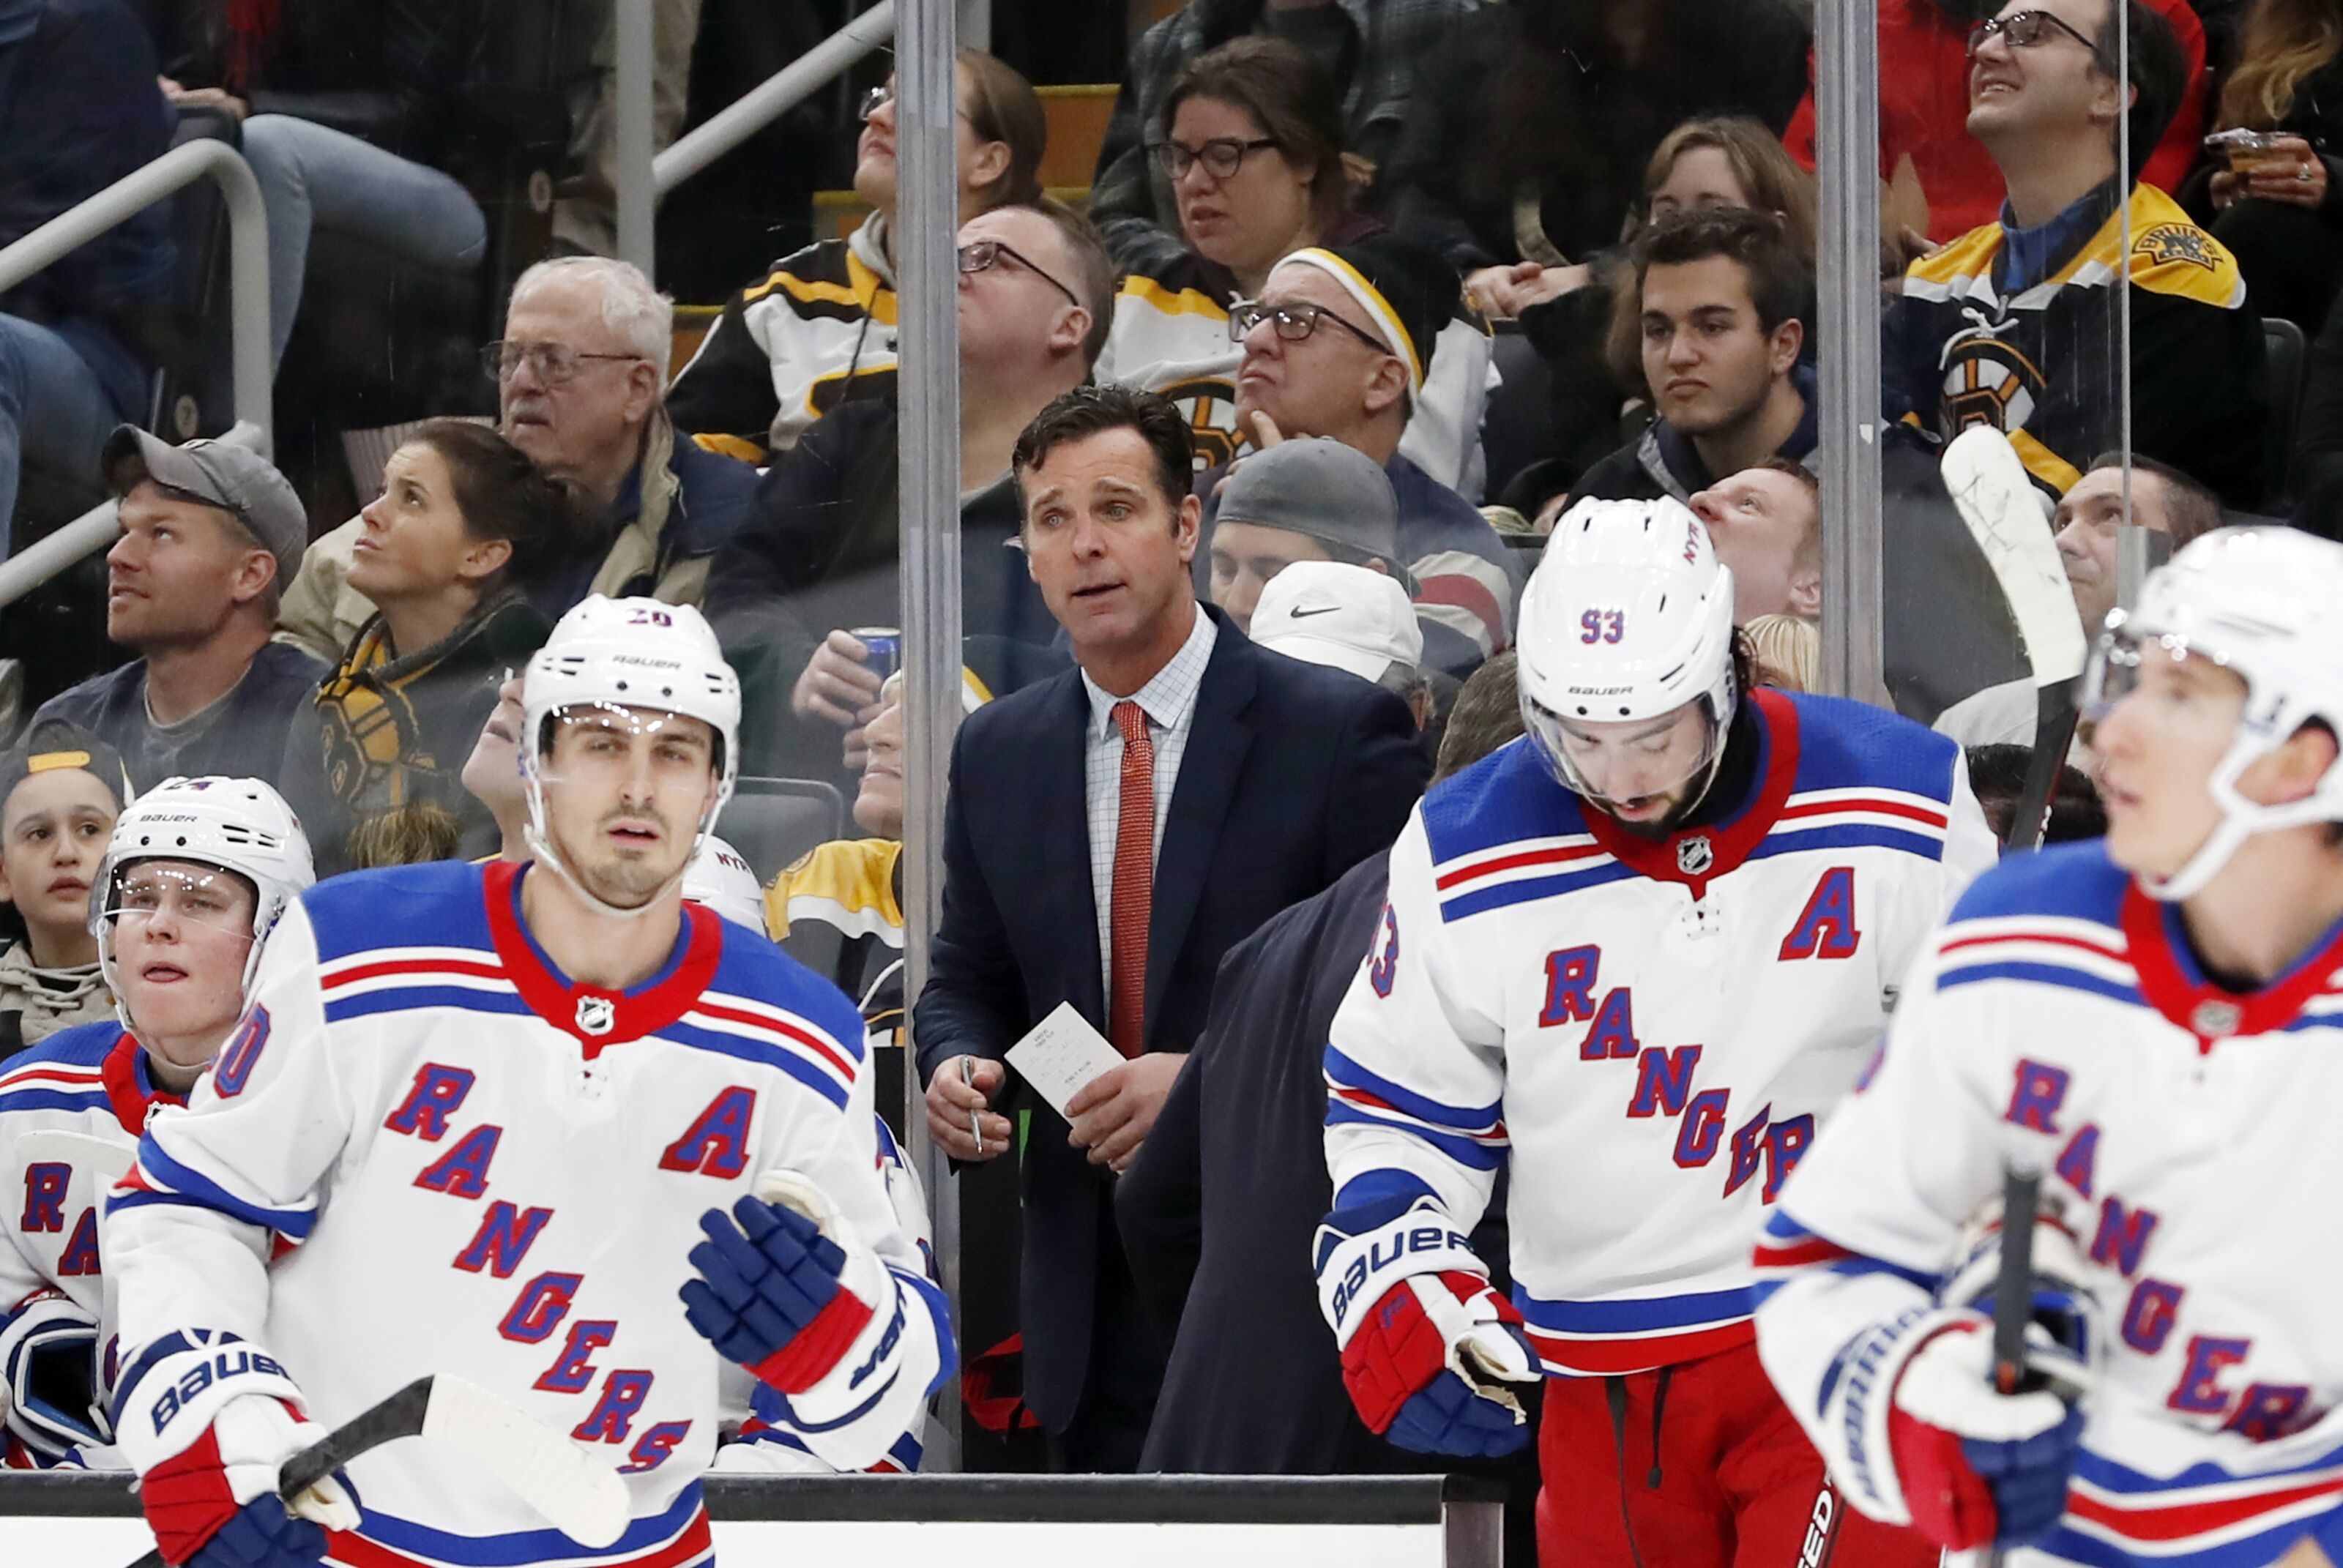 New York Rangers: David Quinn is the last man standing